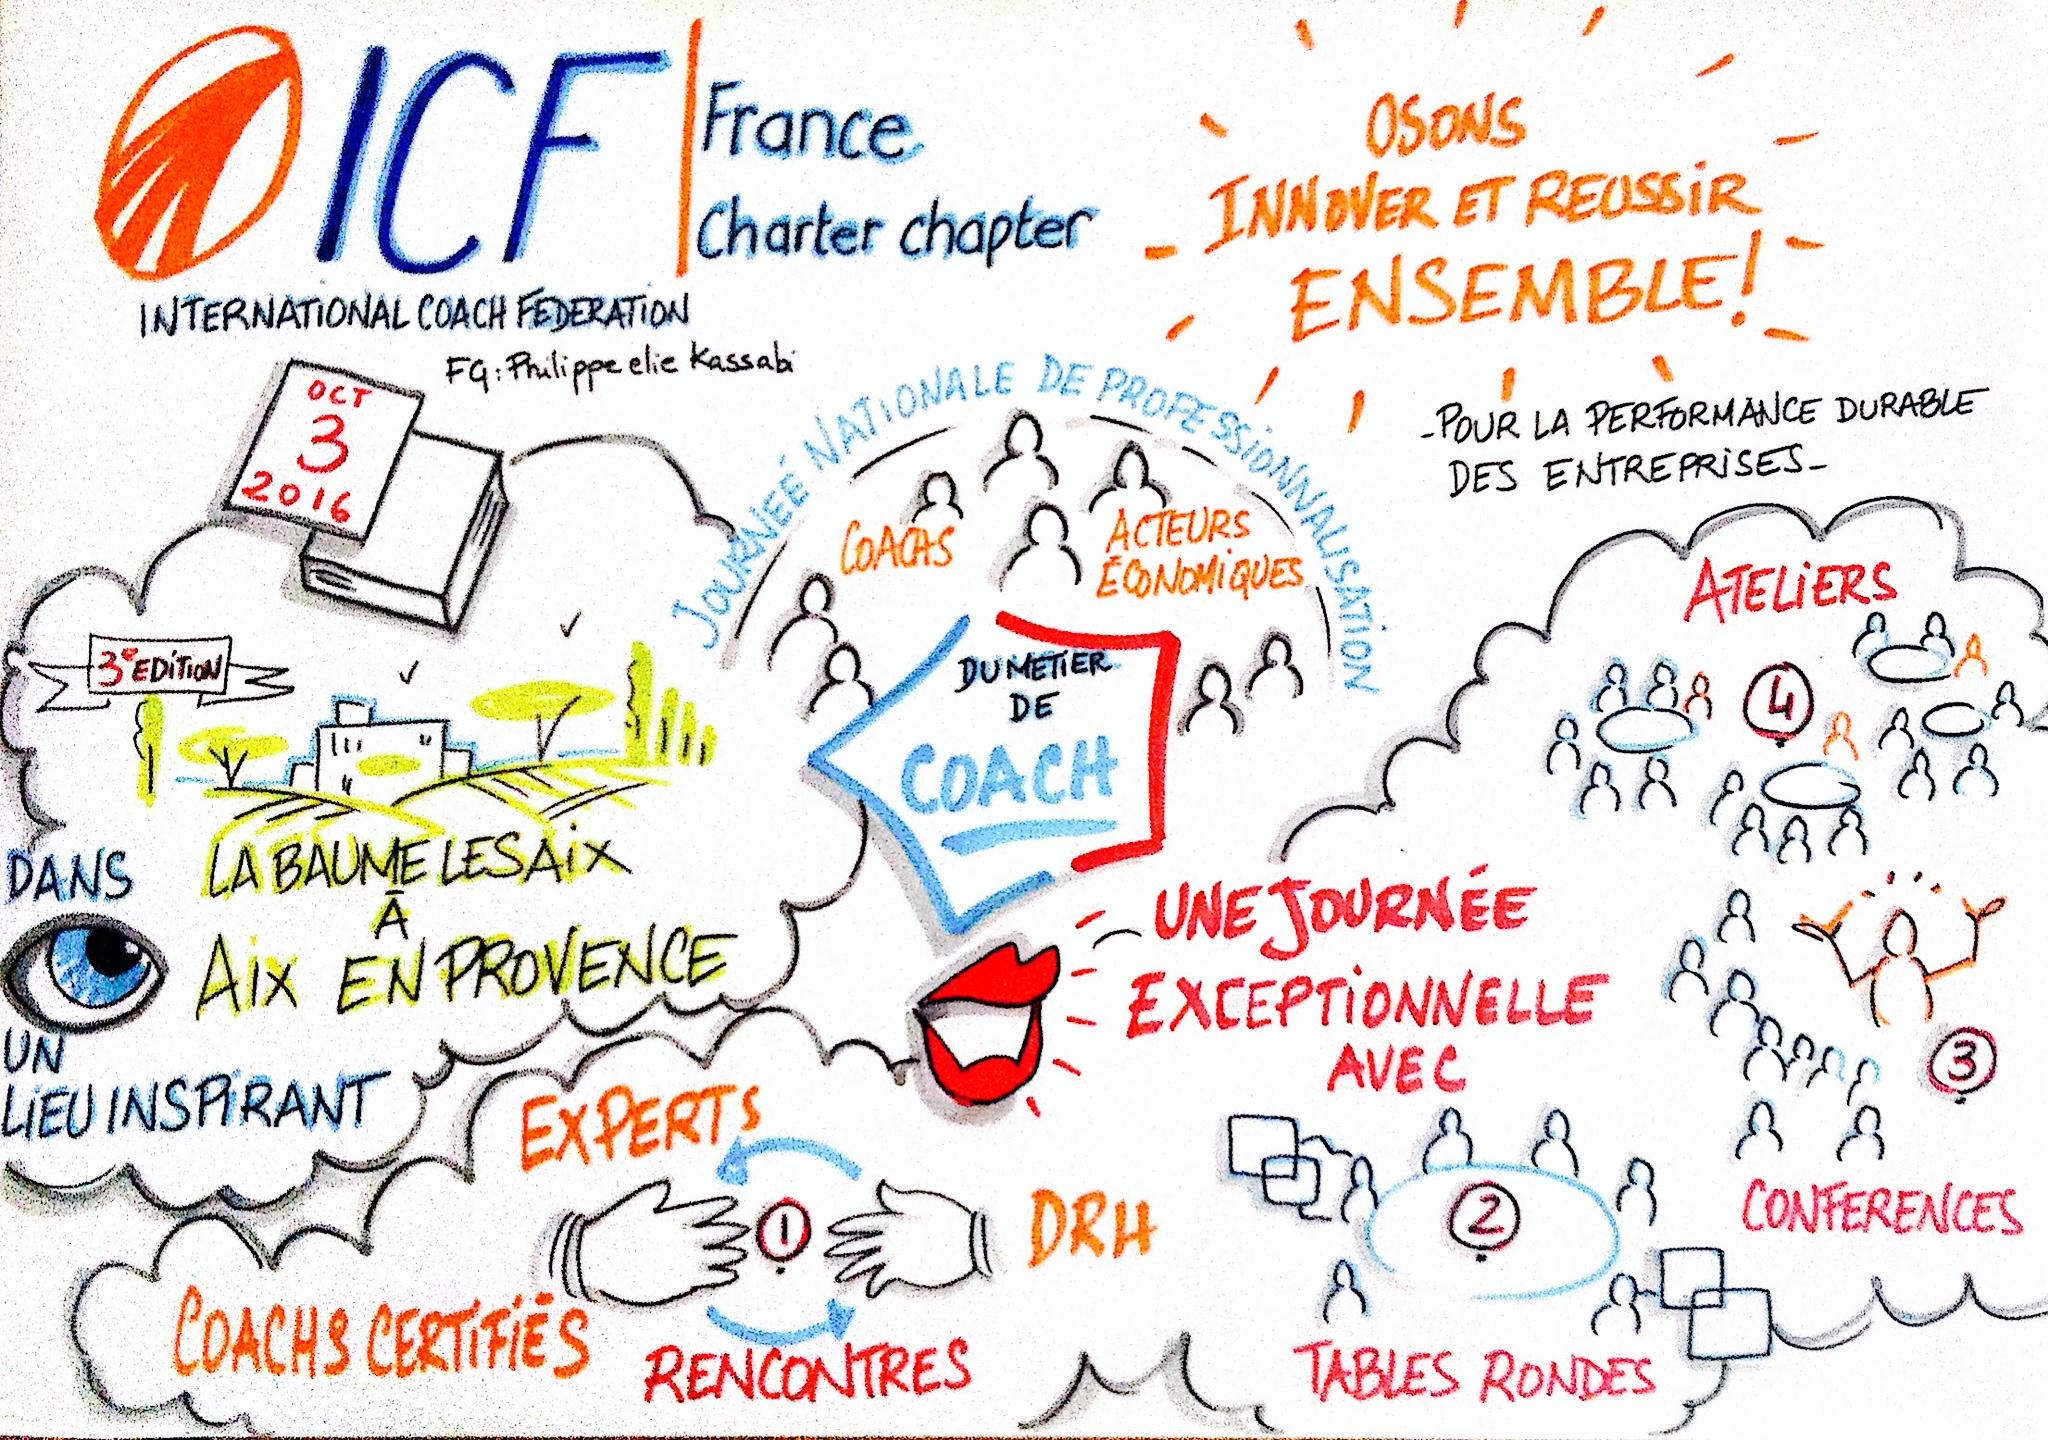 Visuel ICFF 3 10 16